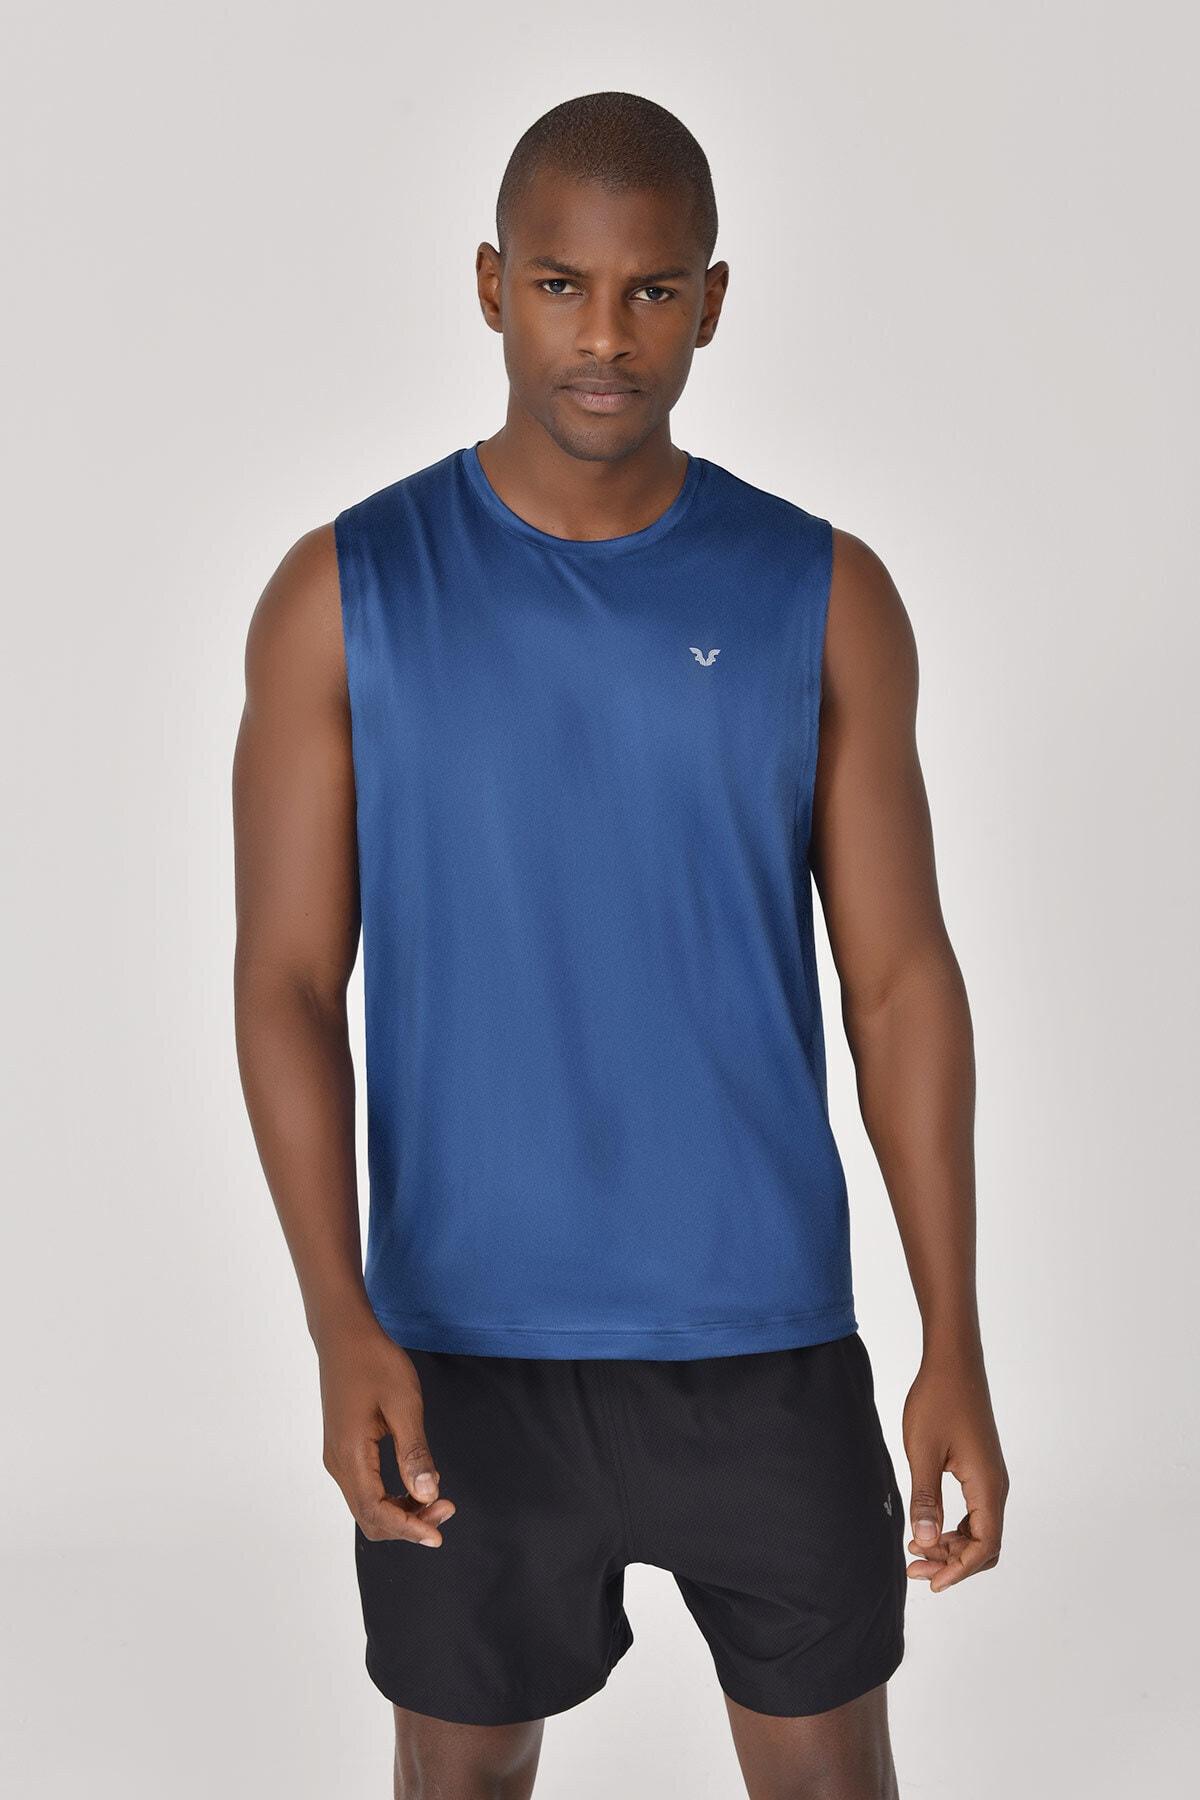 bilcee Mavi Erkek Atlet GS-8862 1